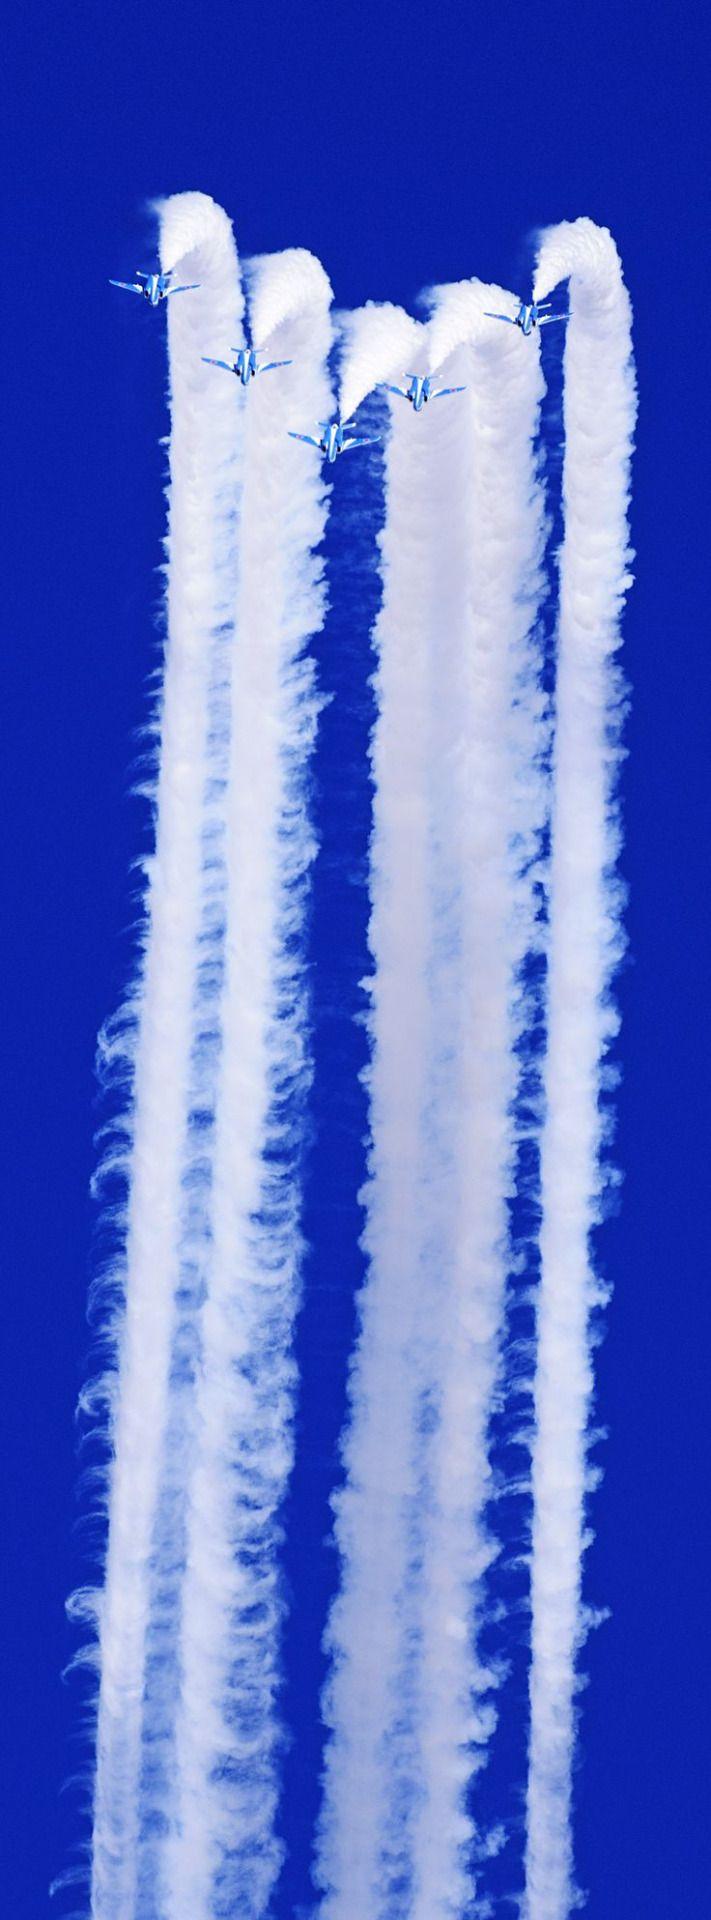 Blue Angels Air Show ♥                                                                                                                                                      More